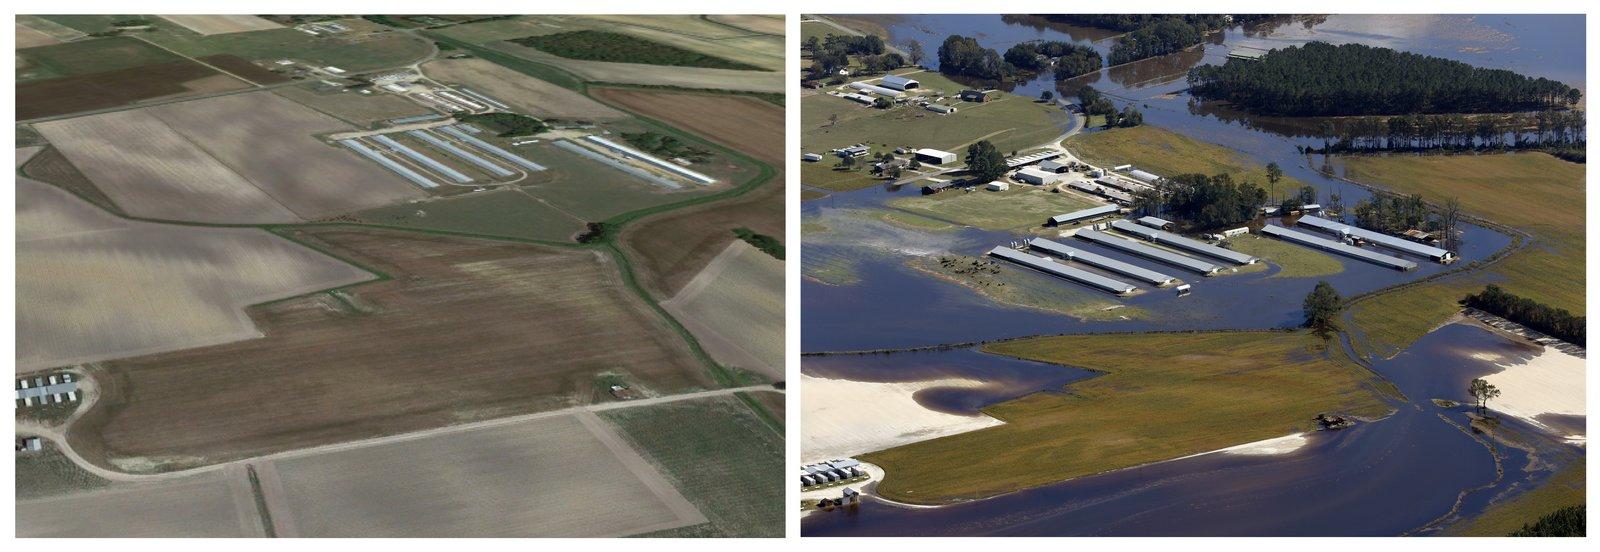 Hurricane Matthew flooding inundated factory farms in North Carolina